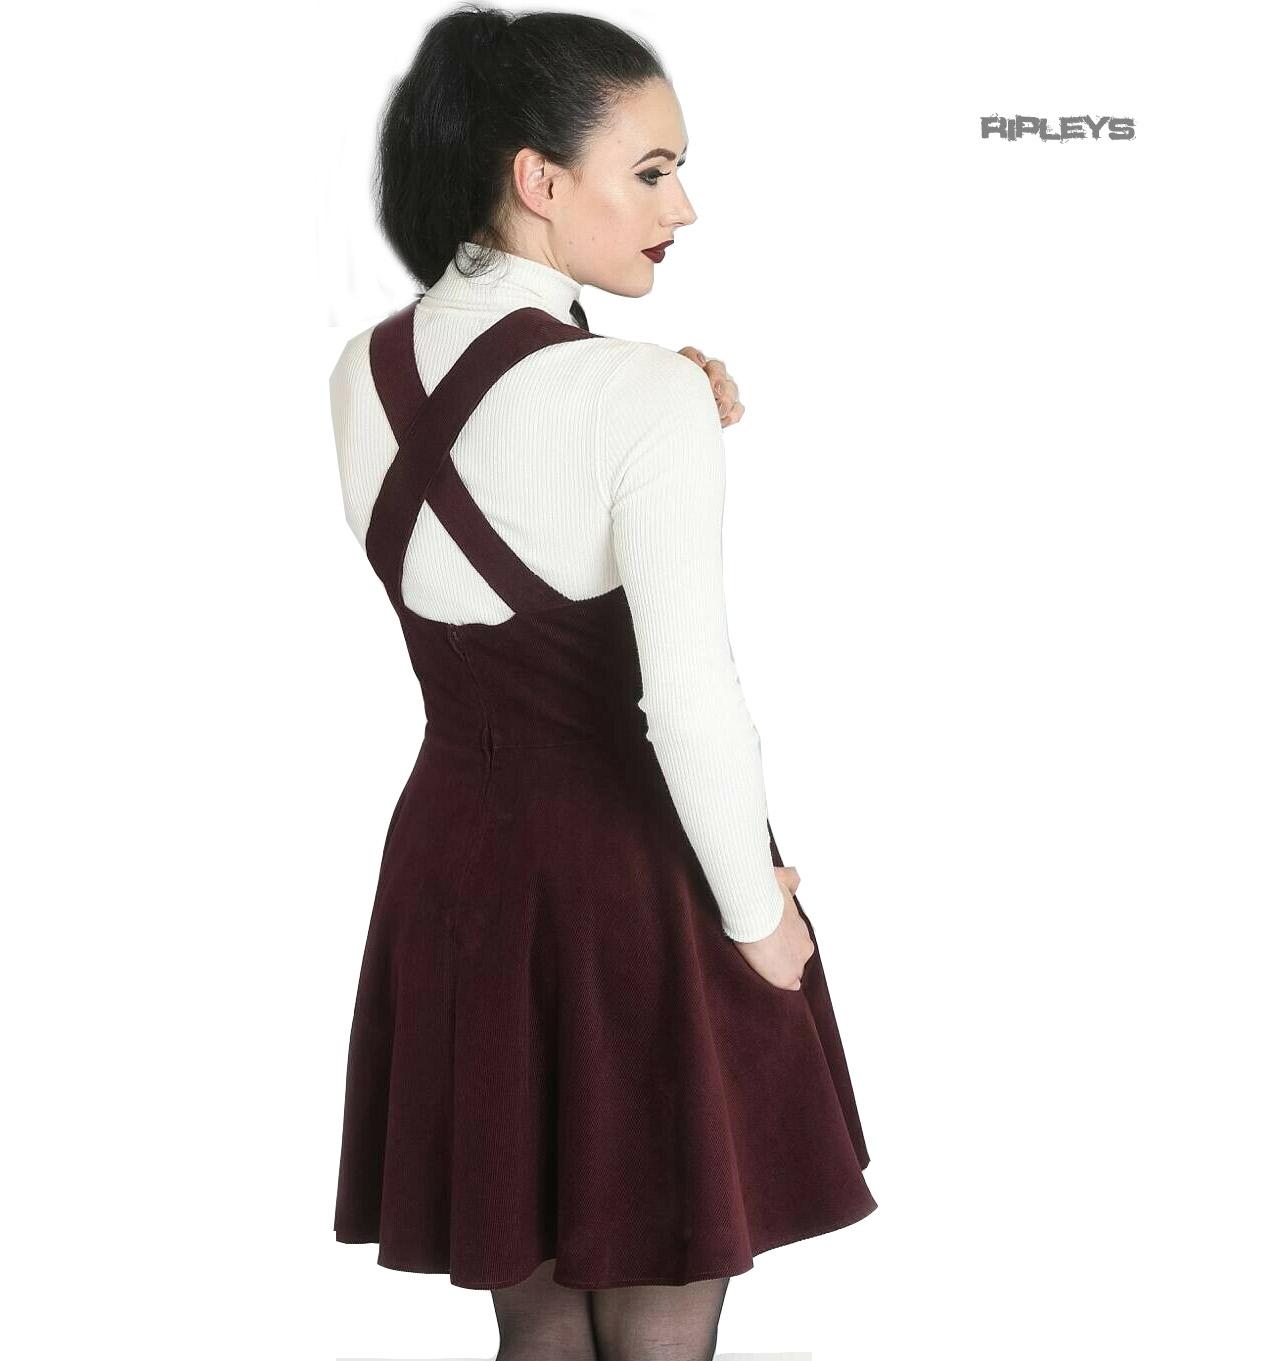 Hell-Bunny-Rockabilly-Corduroy-Mini-Dress-WONDER-YEARS-Pinafore-Wine-All-Sizes thumbnail 16